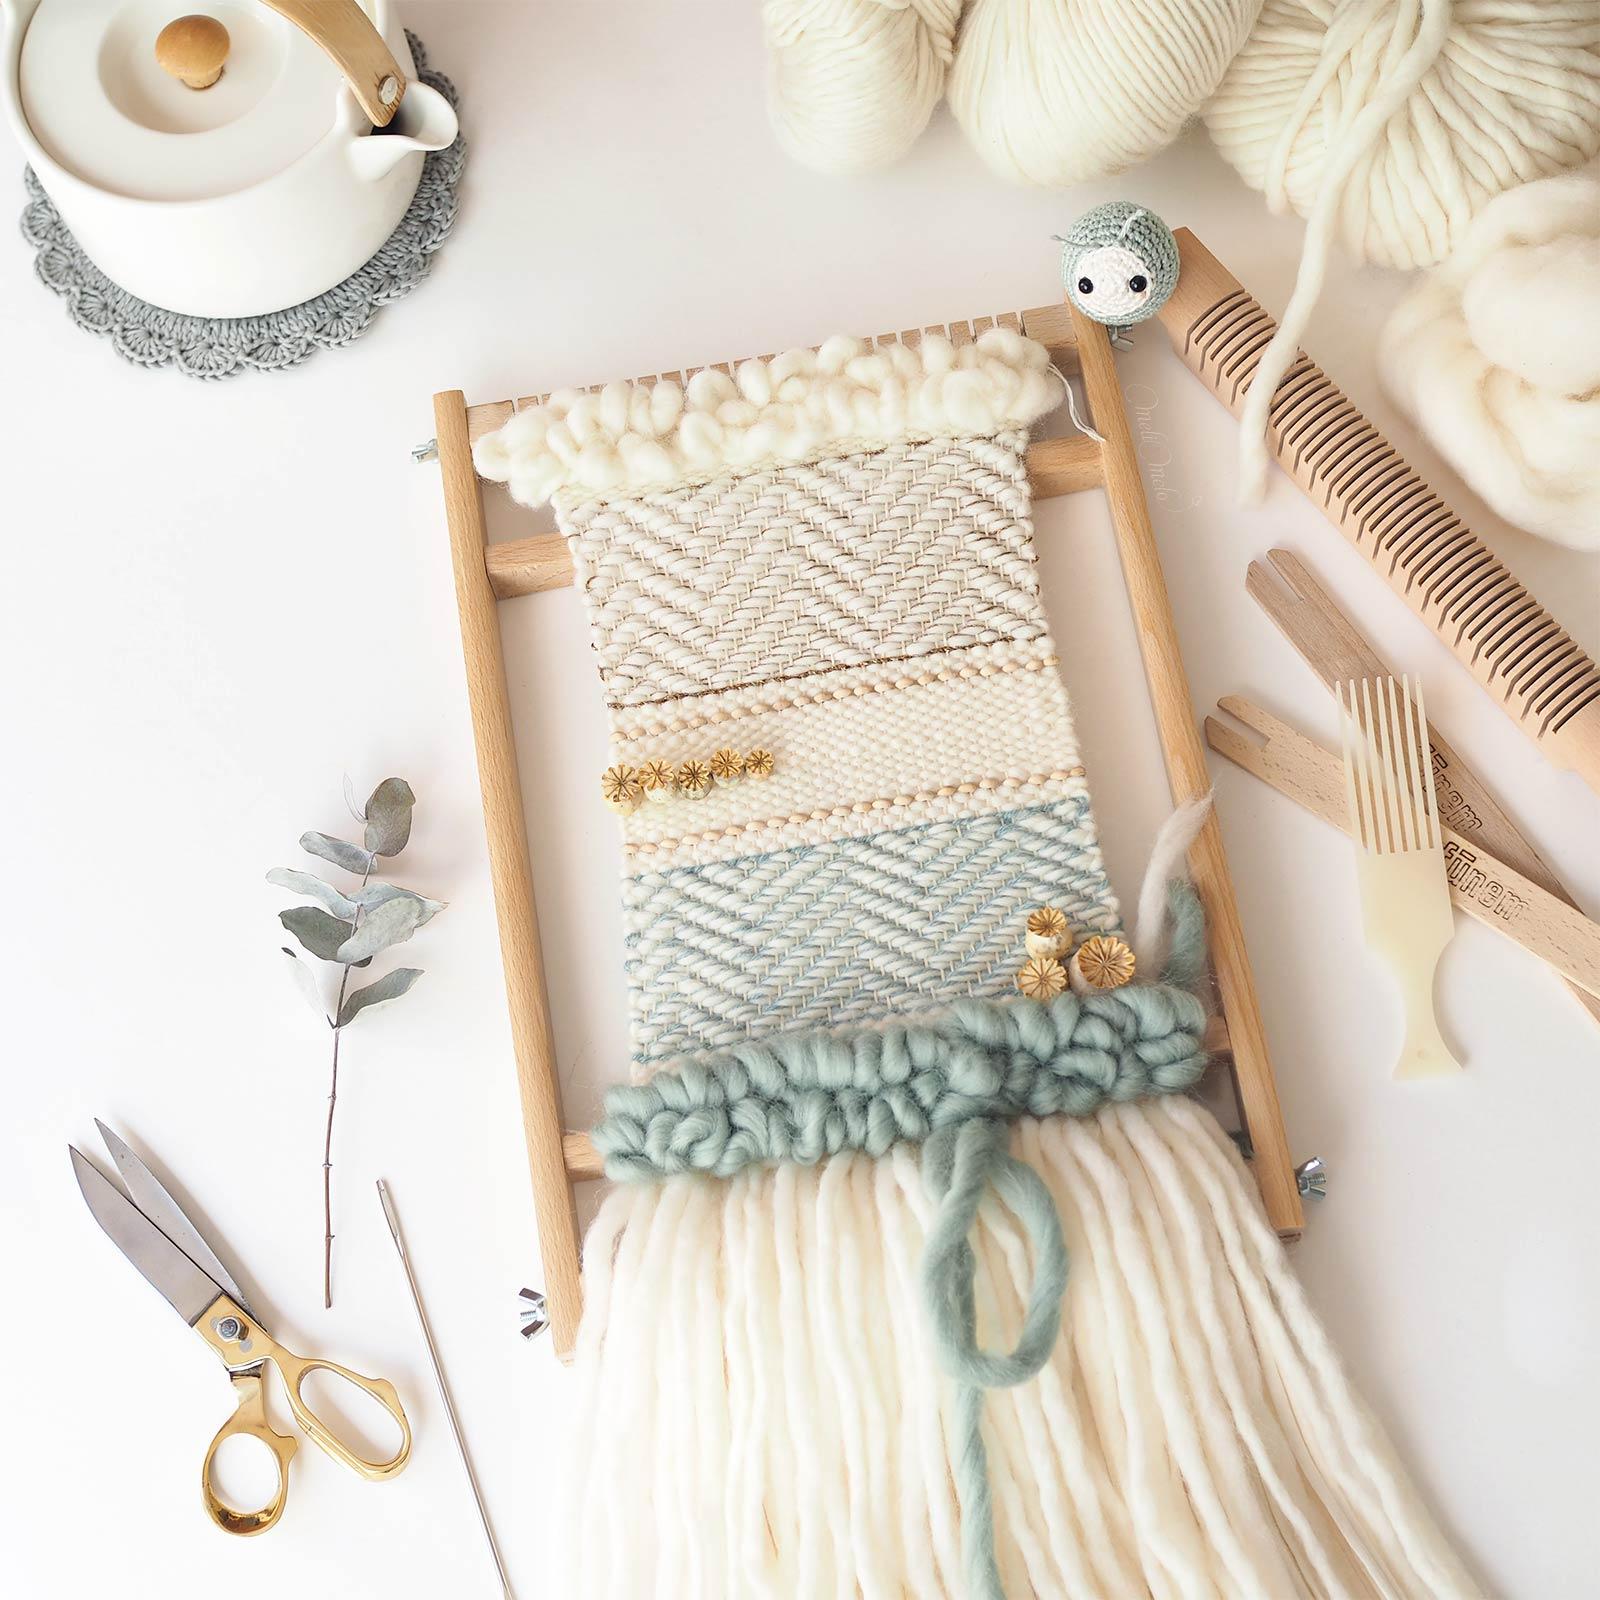 tissage pavots DIYmelimelo kit handweaving #DefiTissage1 wearekniters woolandthegang laboutiquedemelimelo